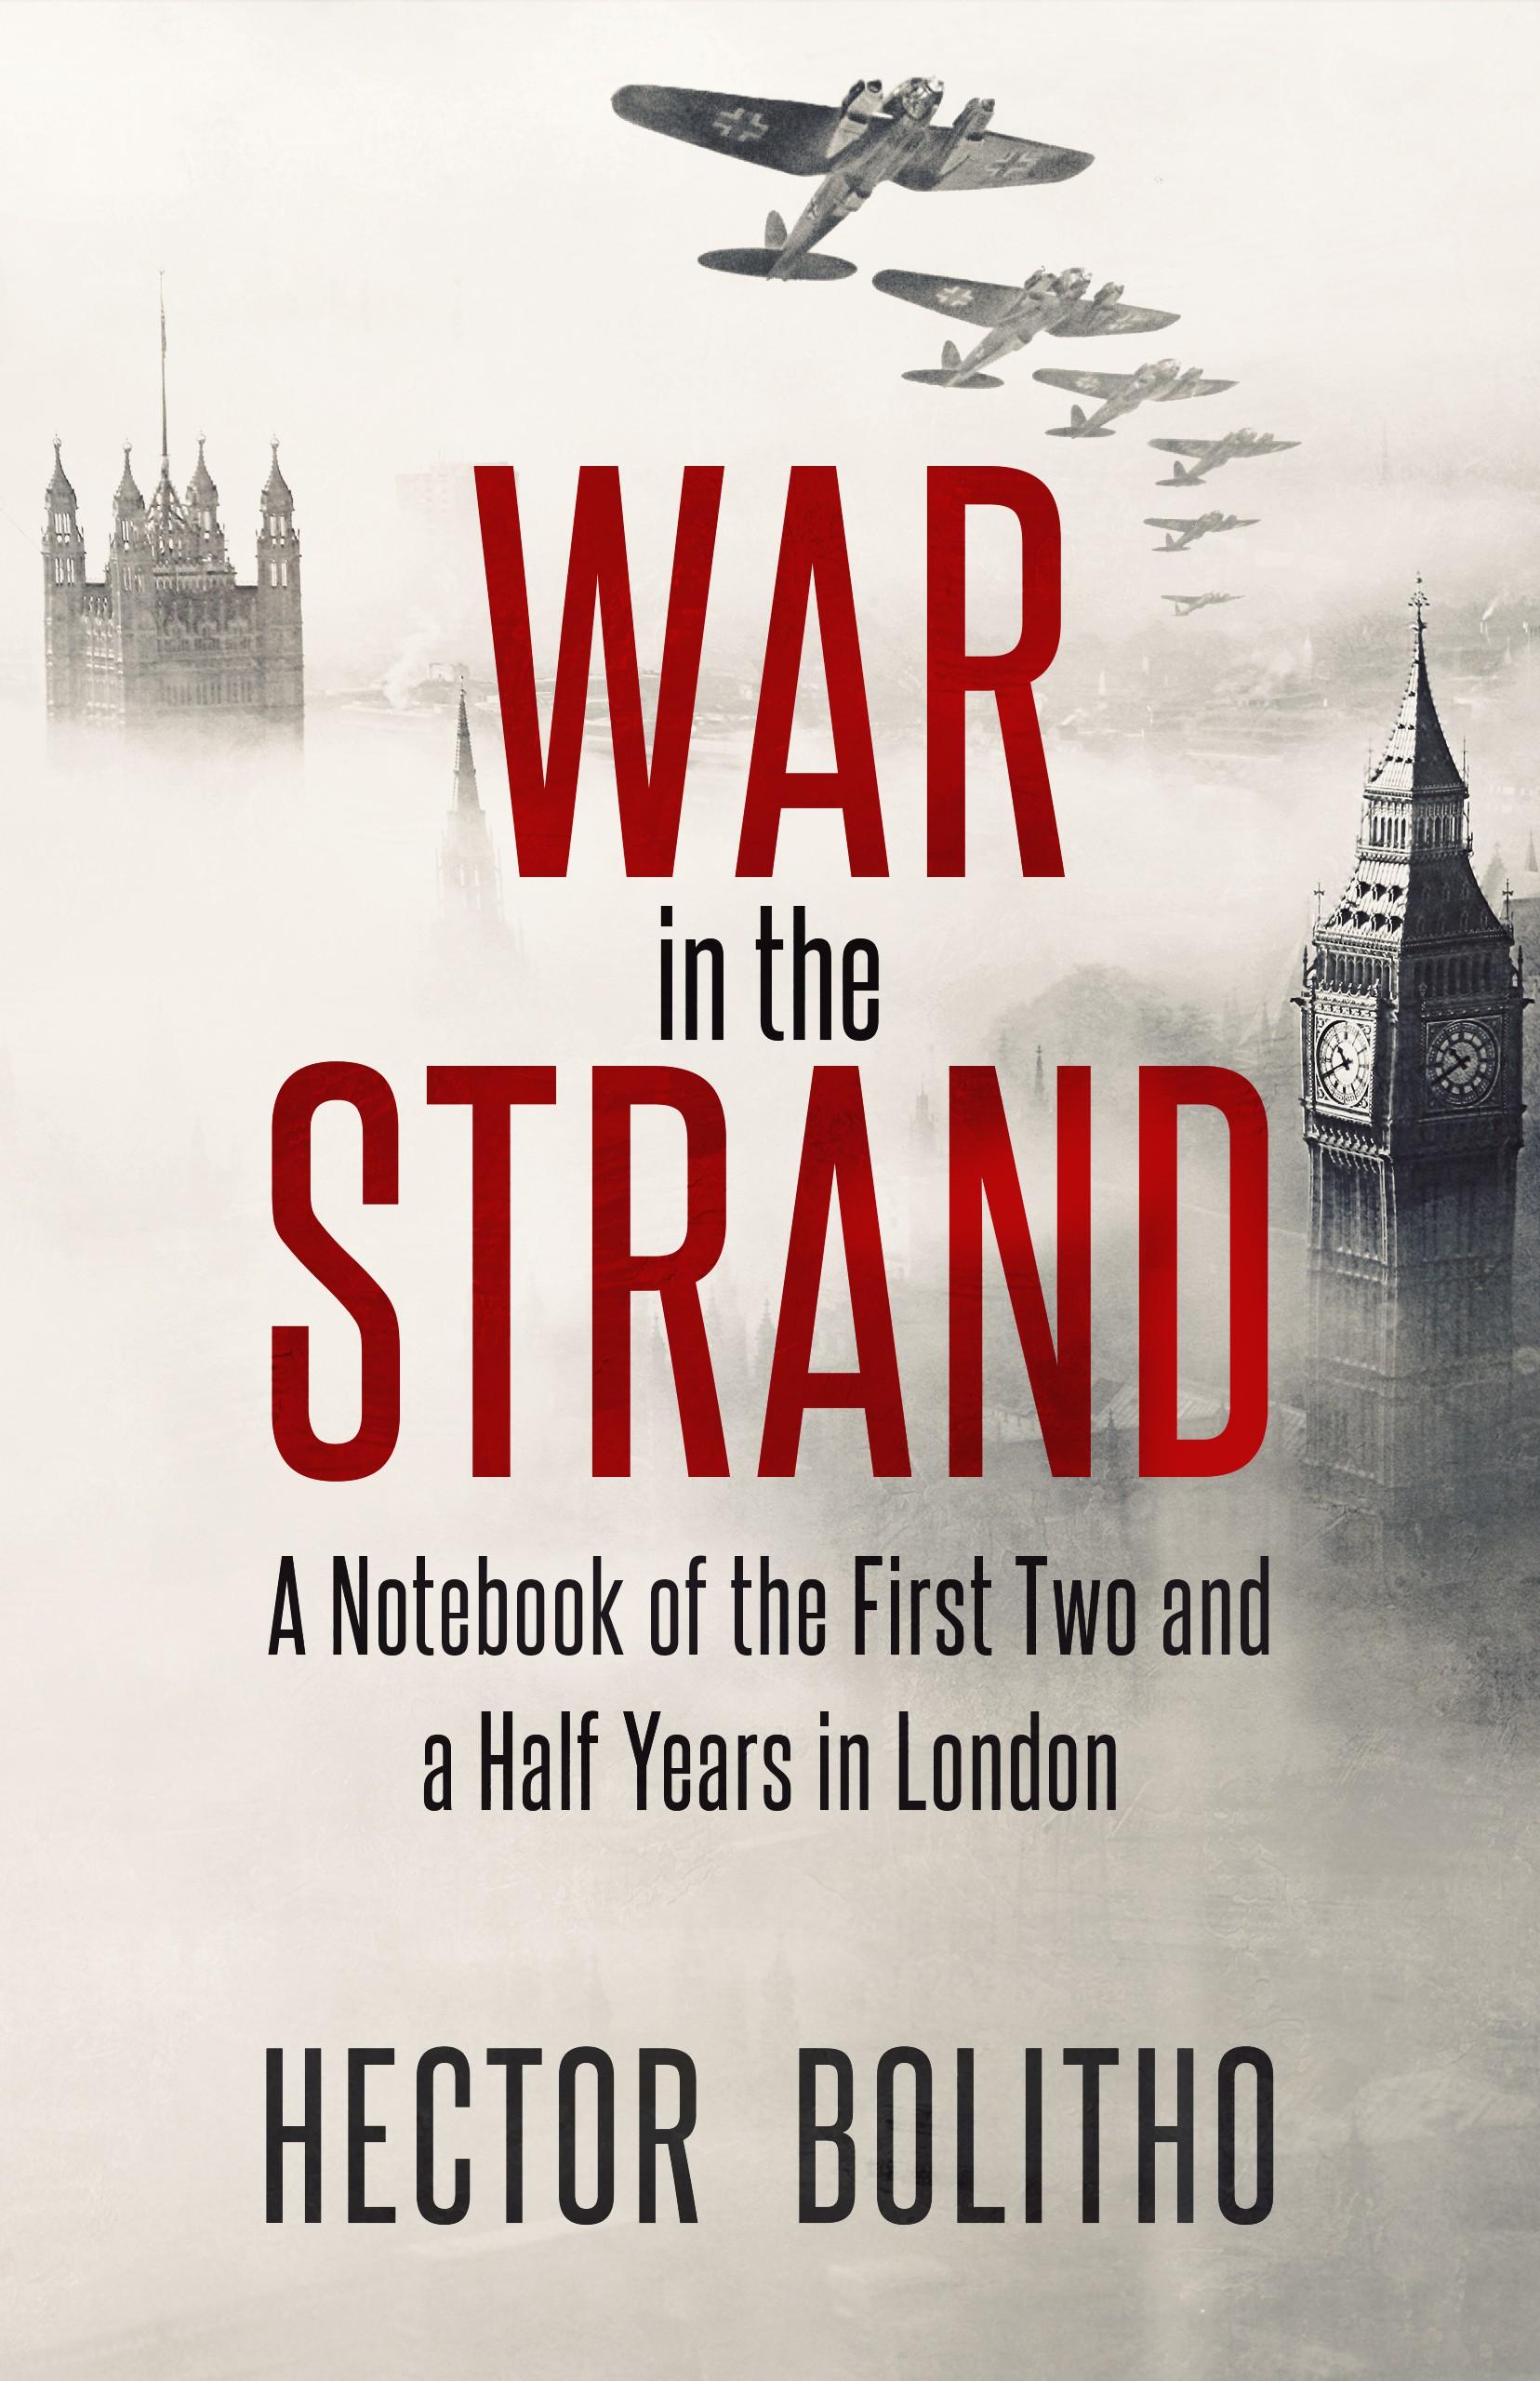 London WWII Memoir